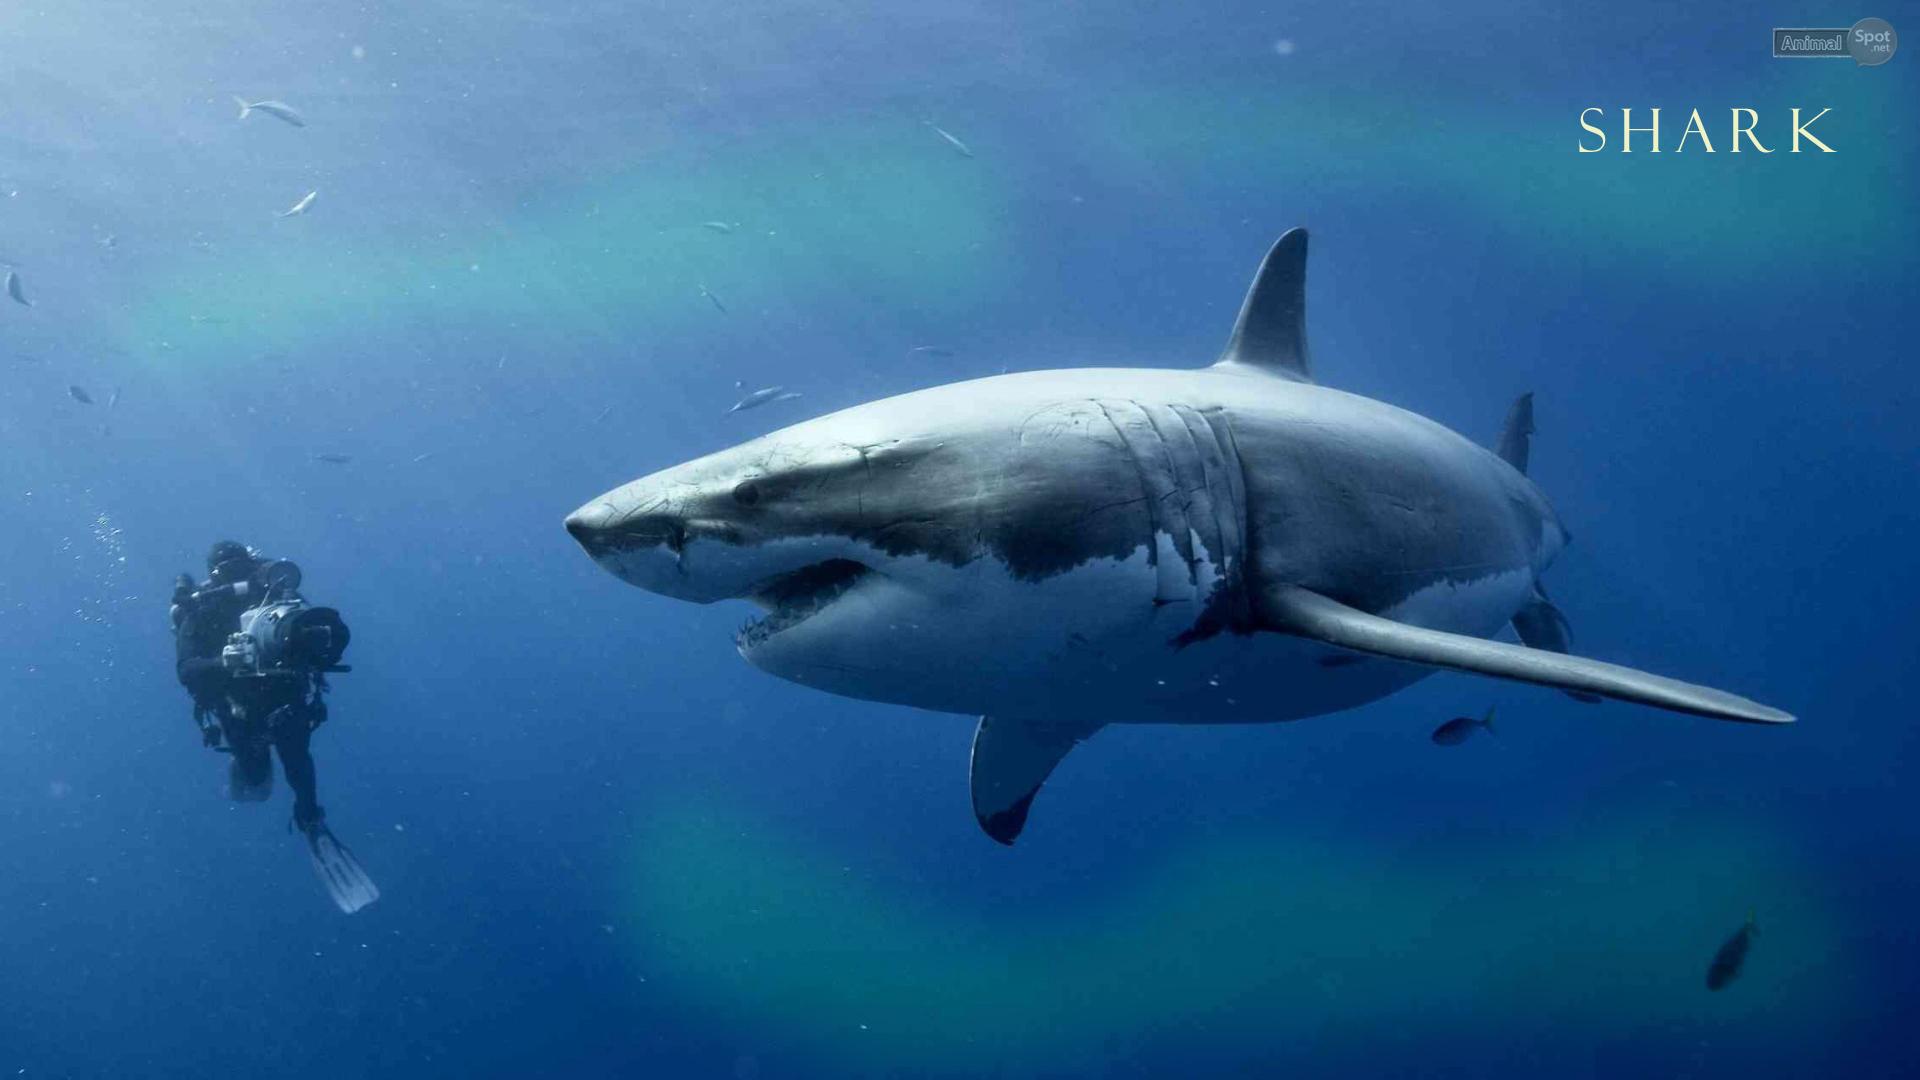 Shark Wallpapers - Animal Spot